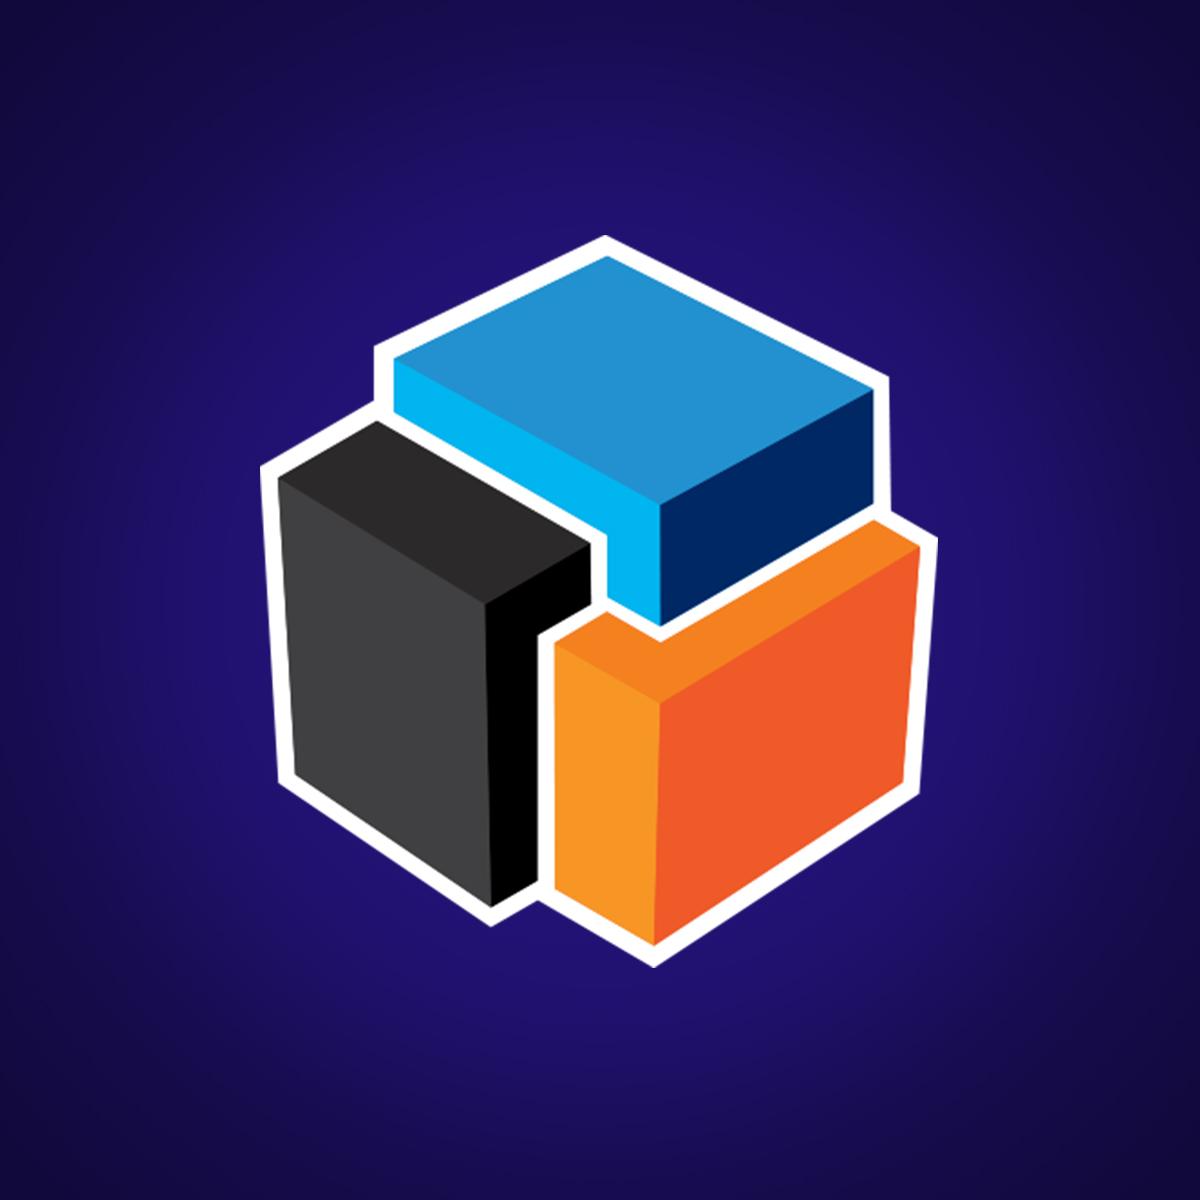 The webpage of Block Bits Capital by Alisha Rosen